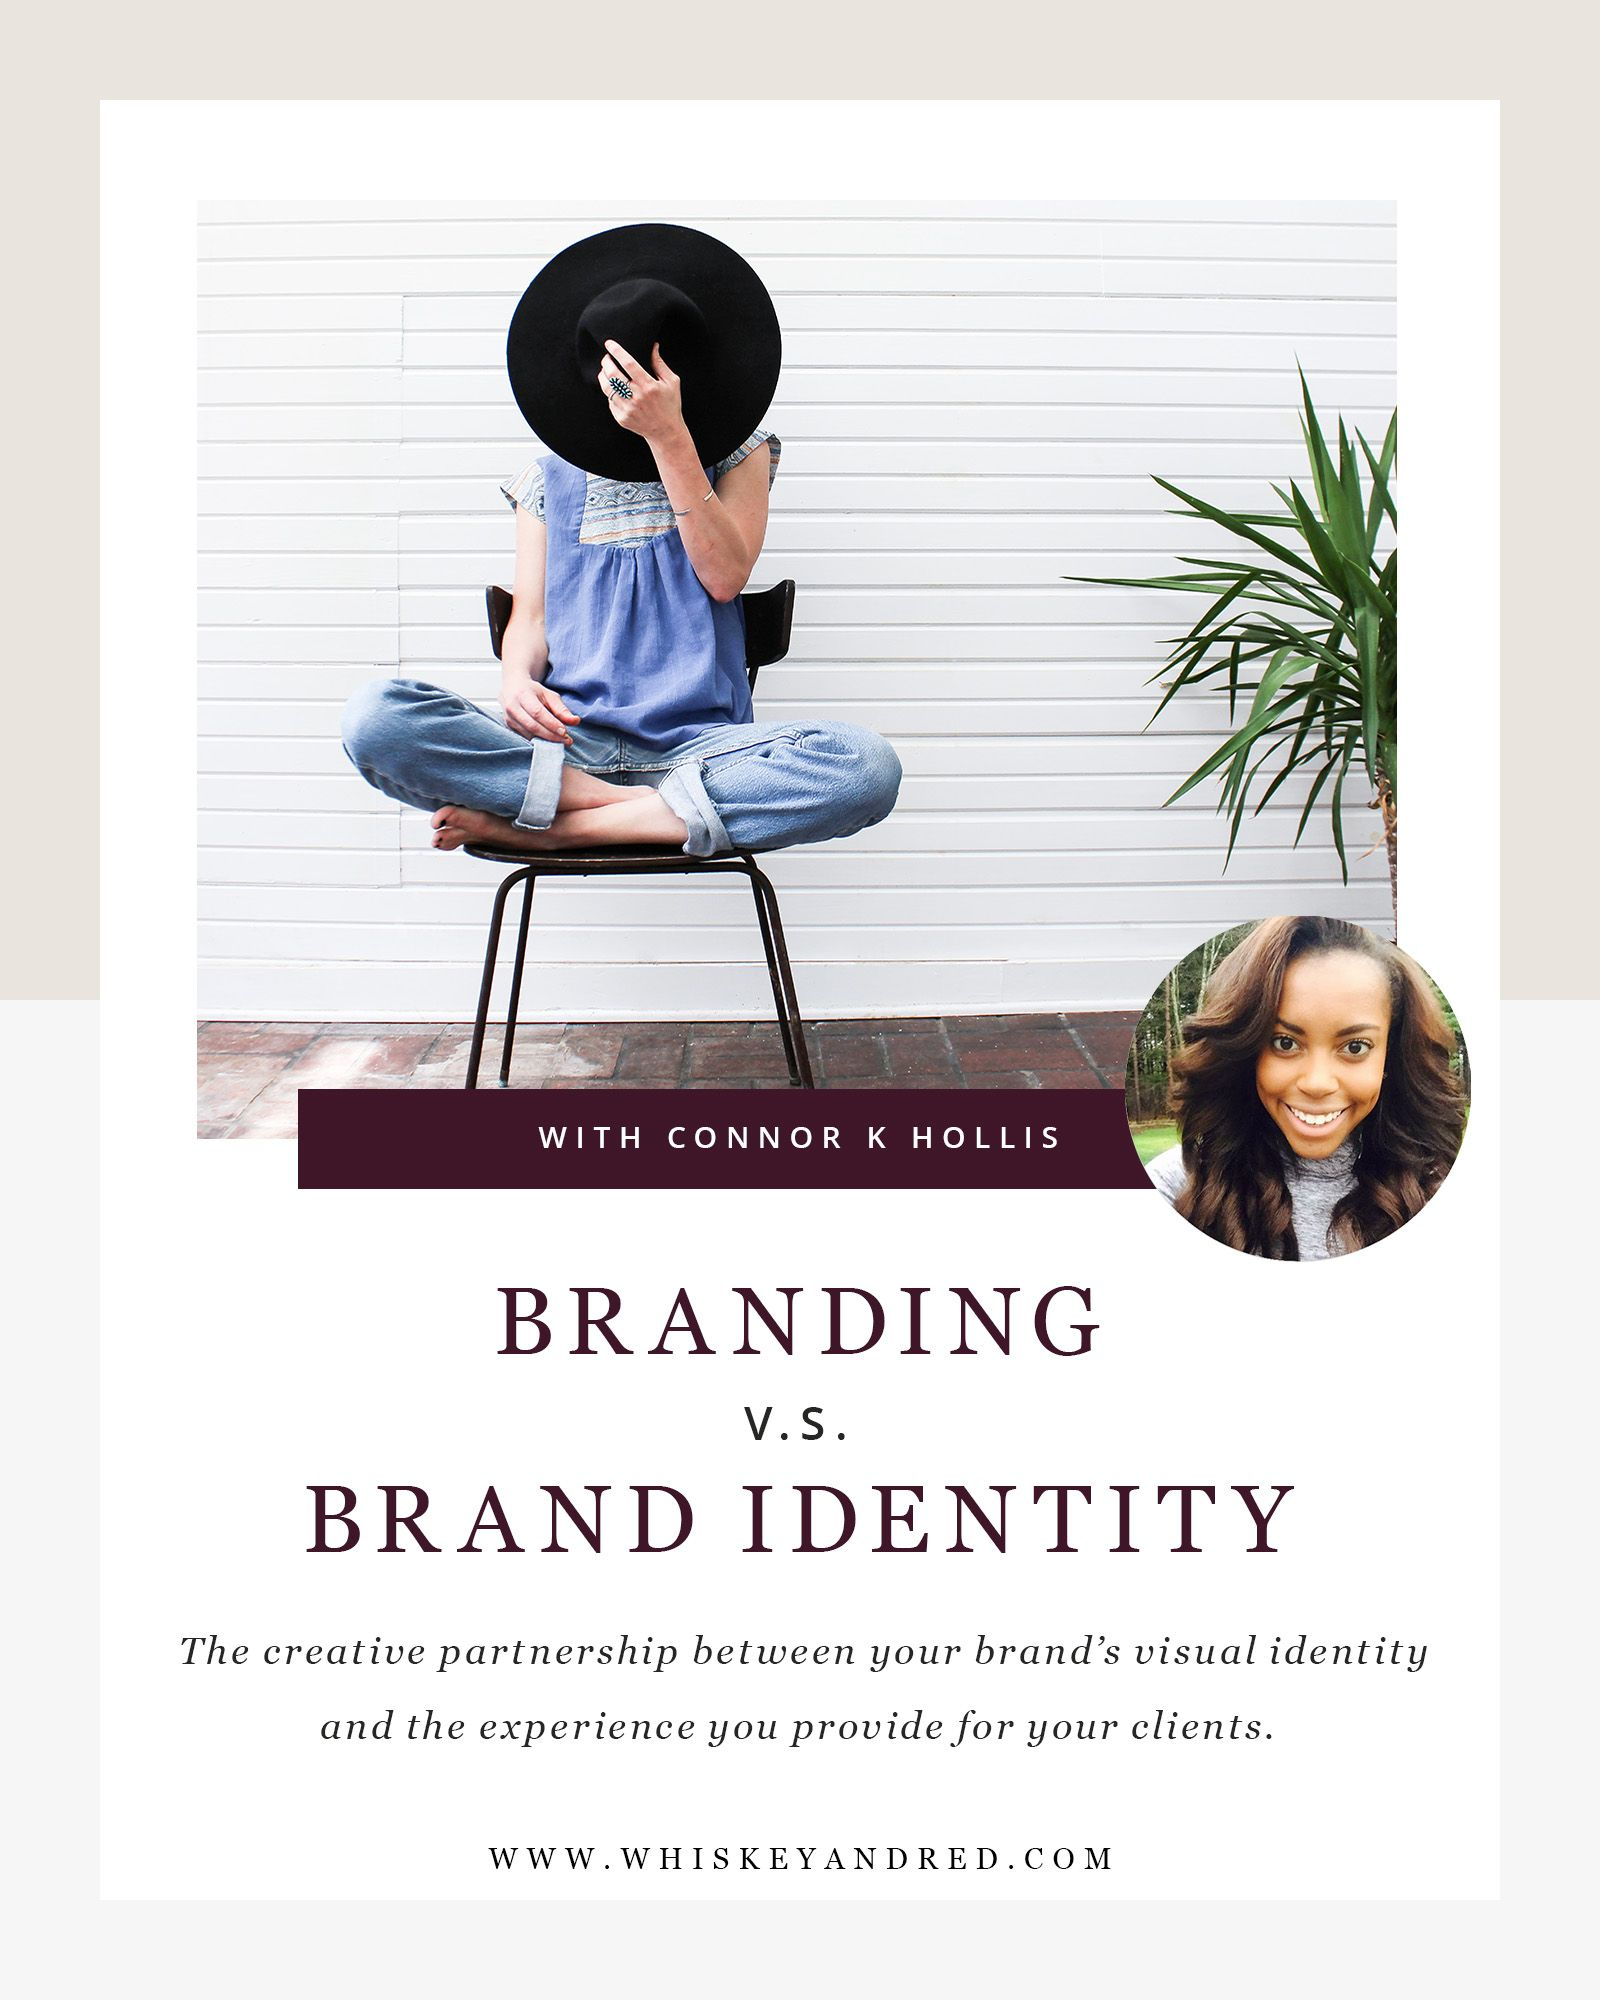 Branding Vs. brand identity image.